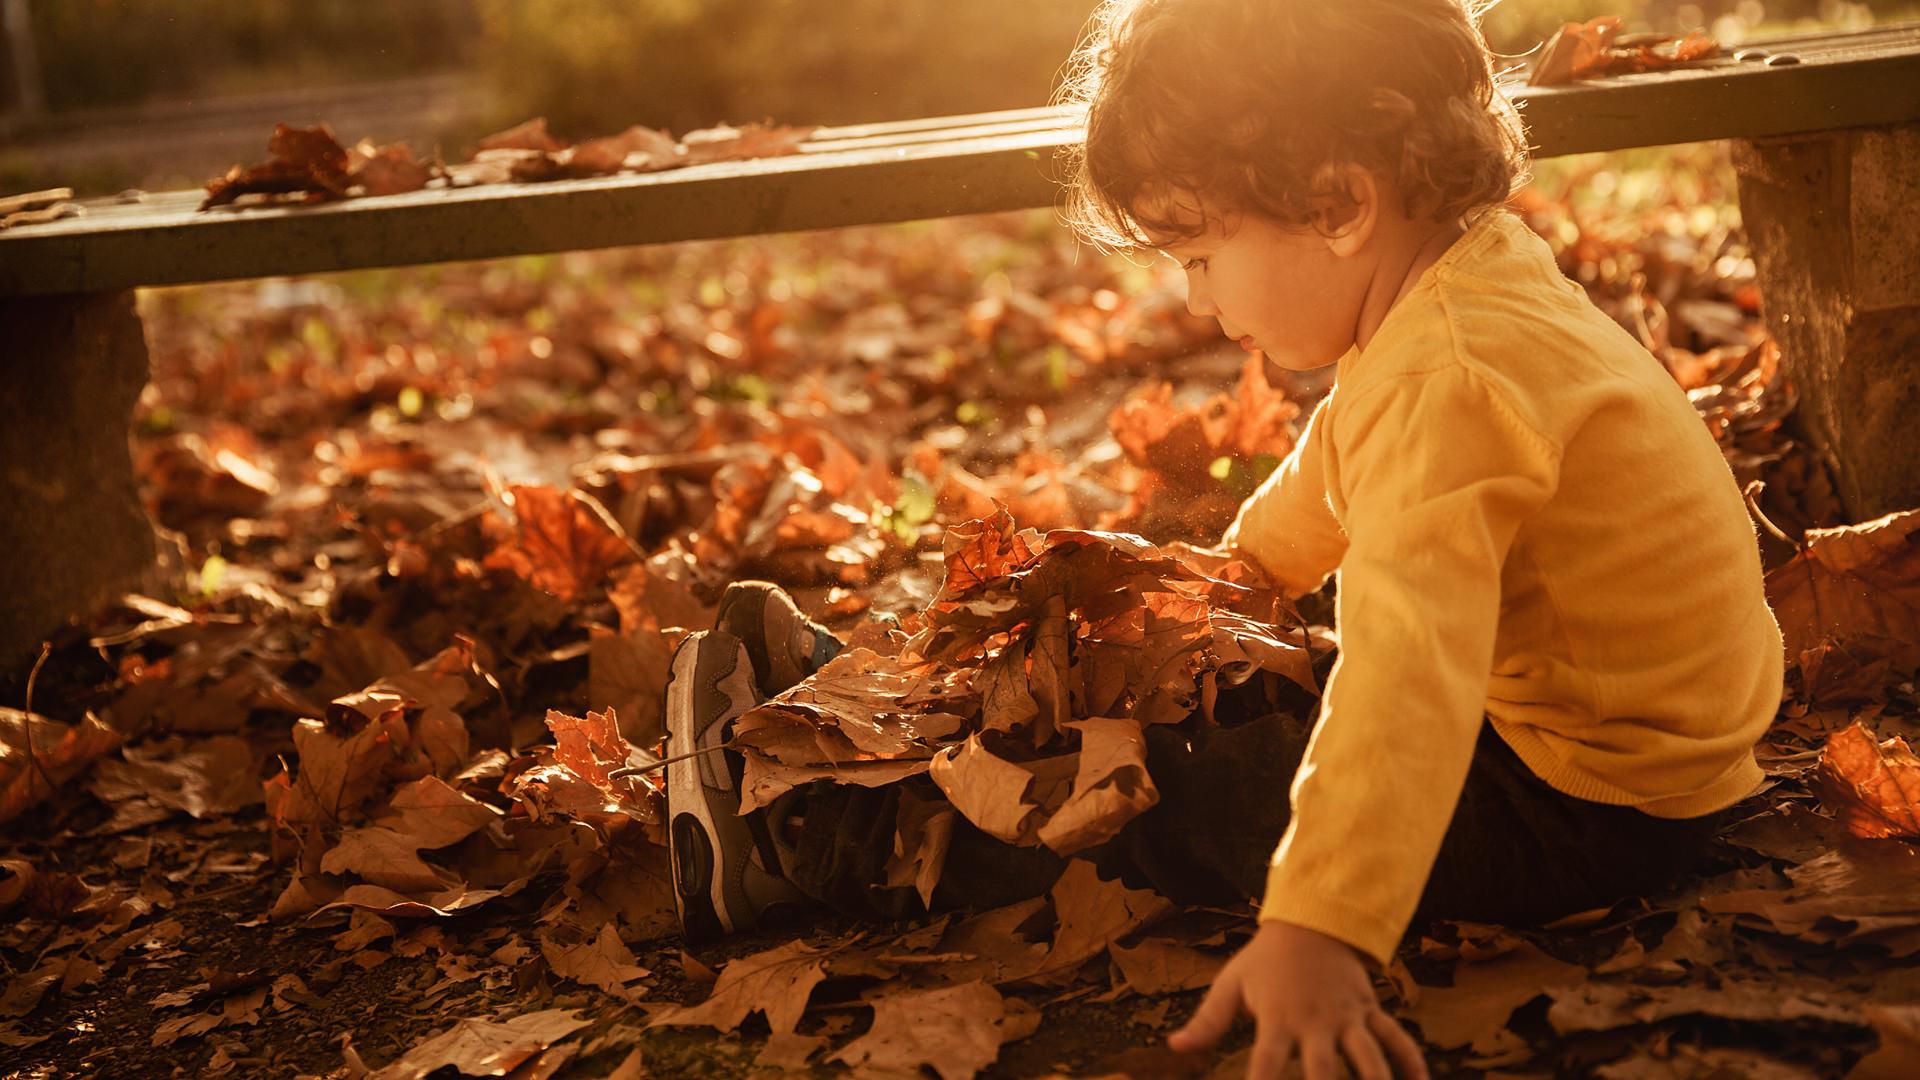 cphc_1920x1080_boy_fall_leaves